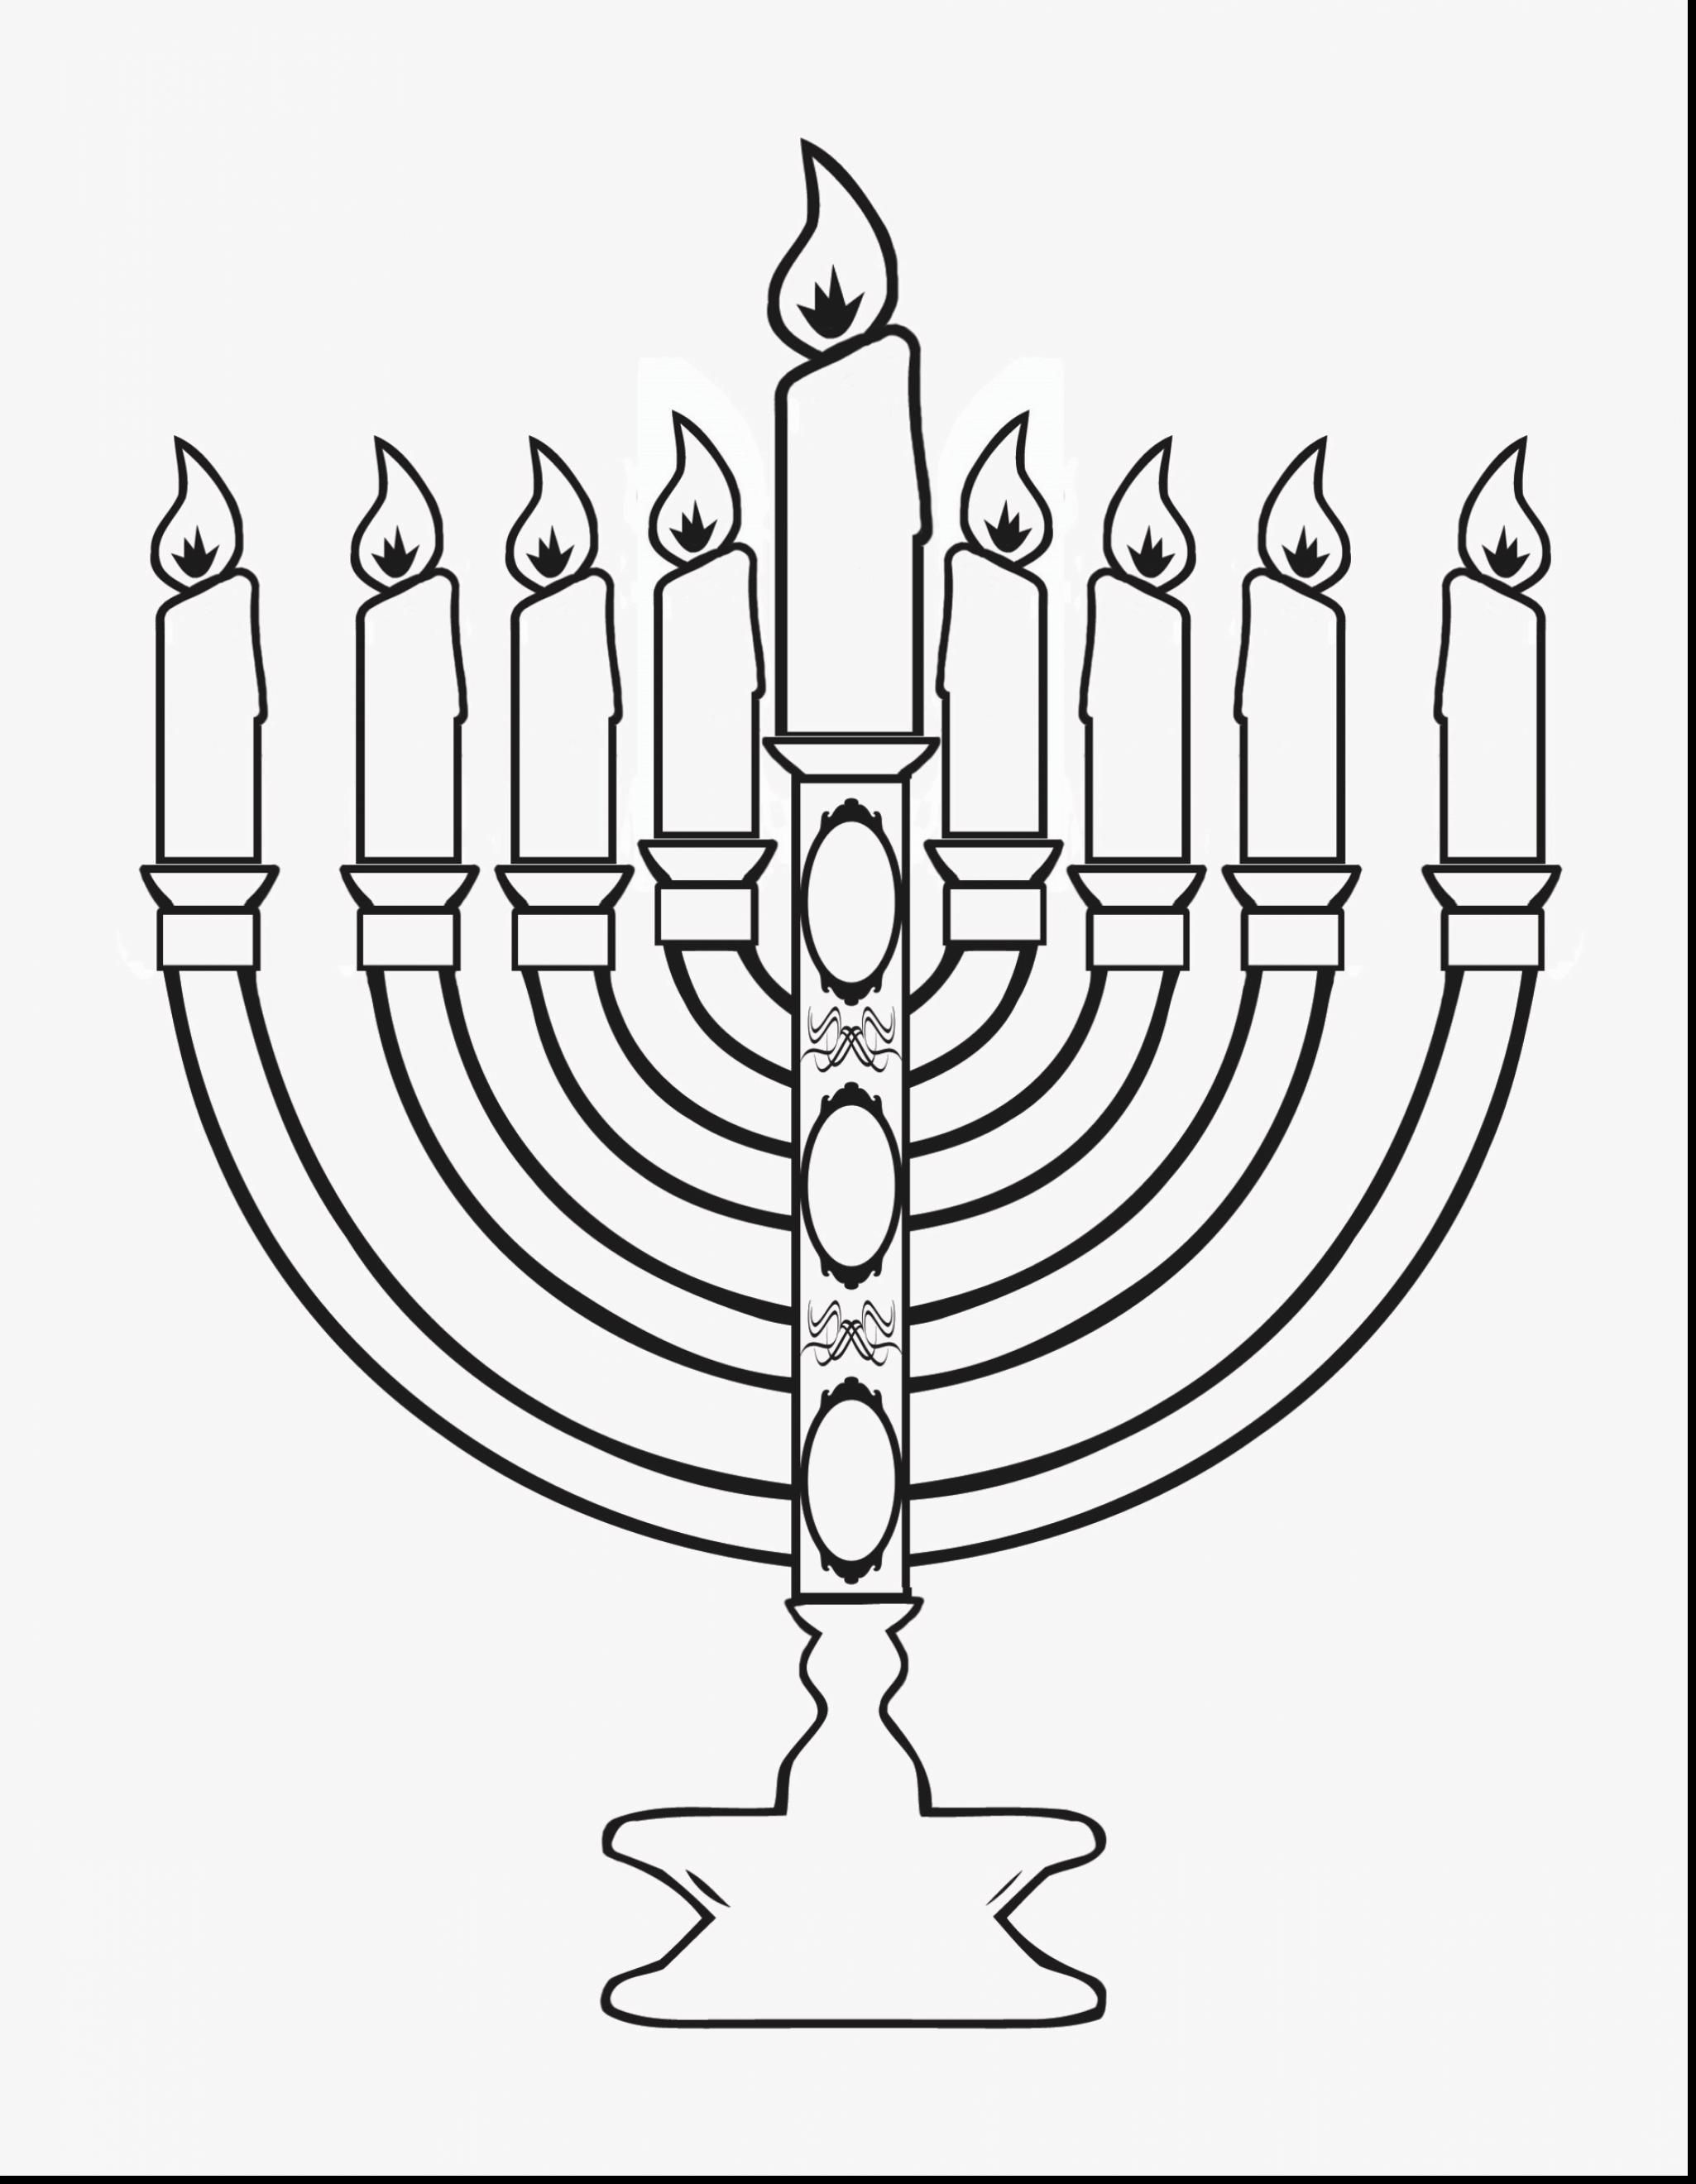 Hanukkah Menorah Outline Free Clip Art With Images Hanukkah